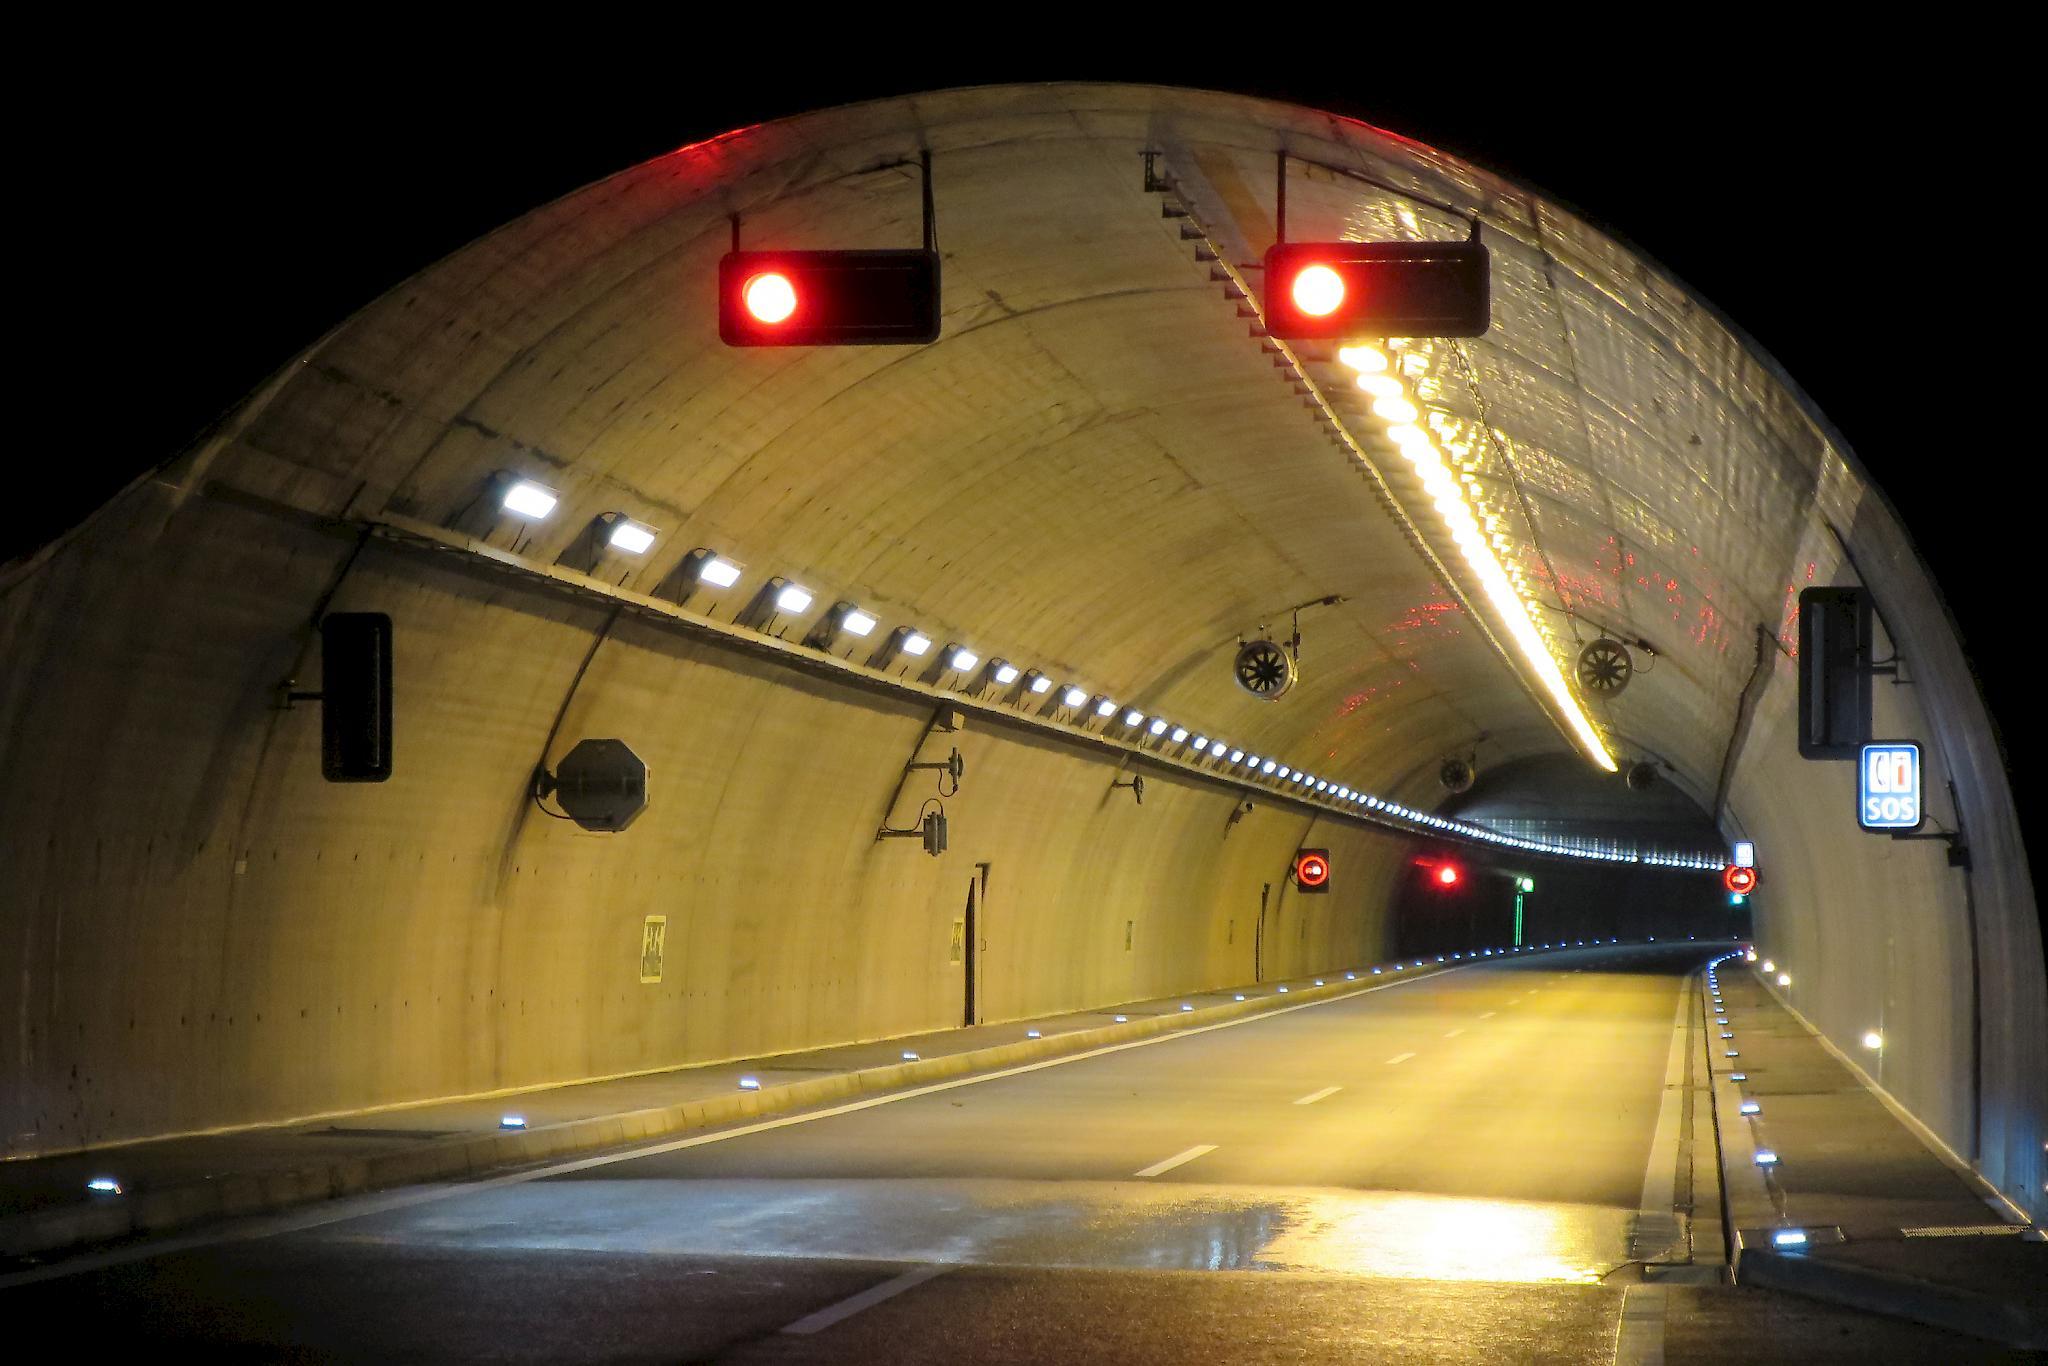 -Autobahntunnel-in-Siders-wieder-befahrbar-